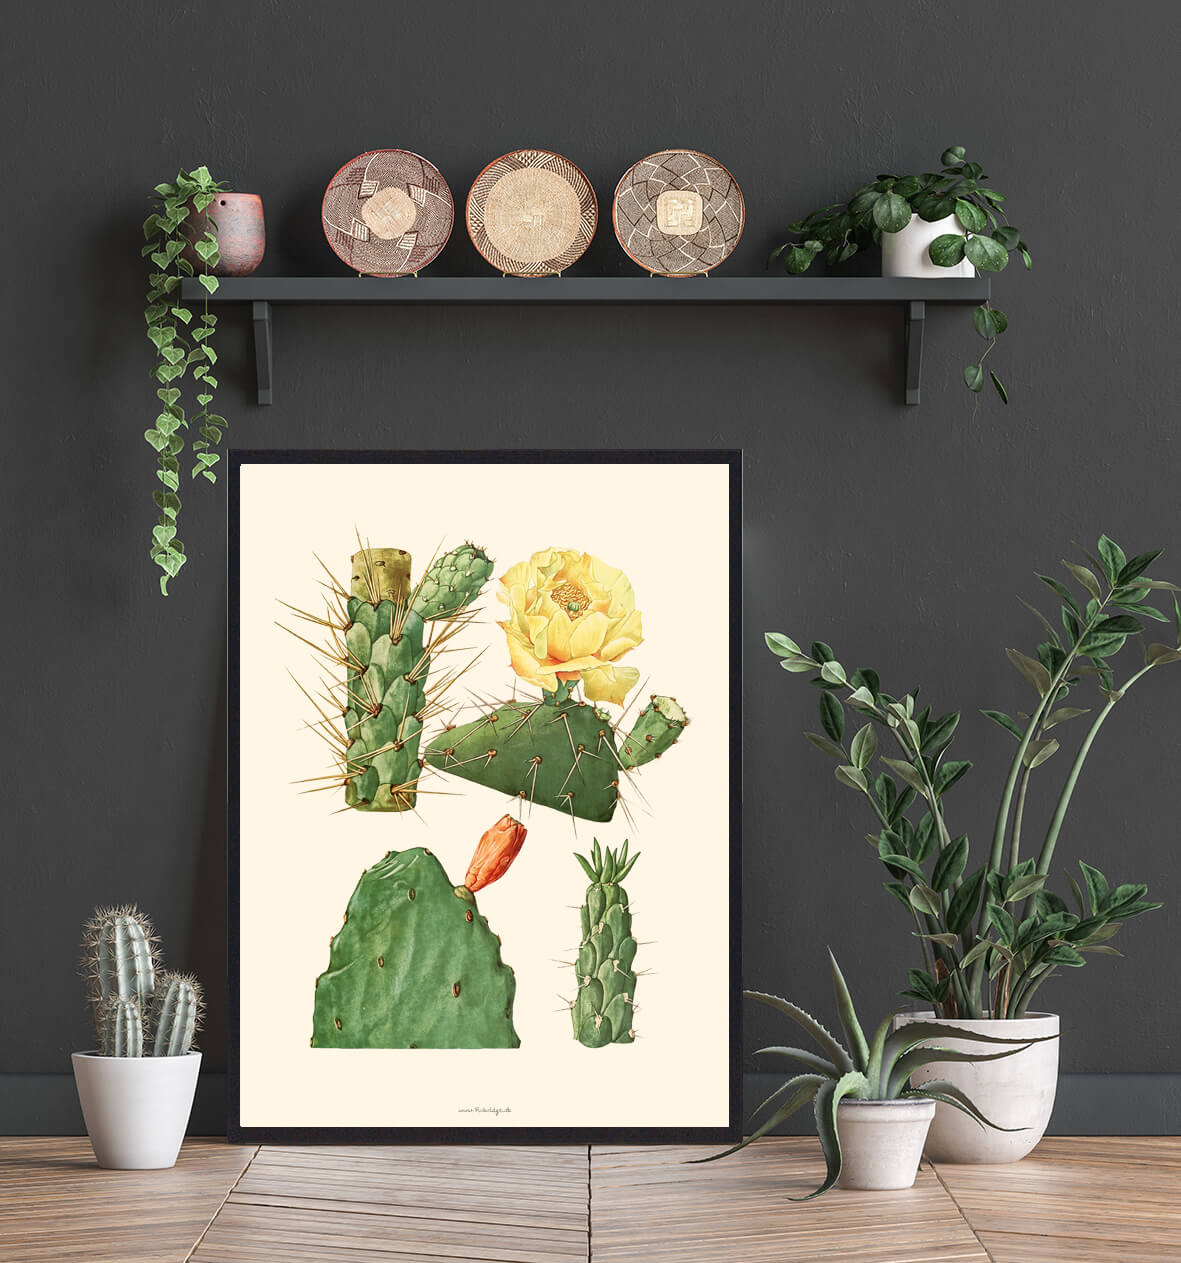 Boligplakat-kaktus-3